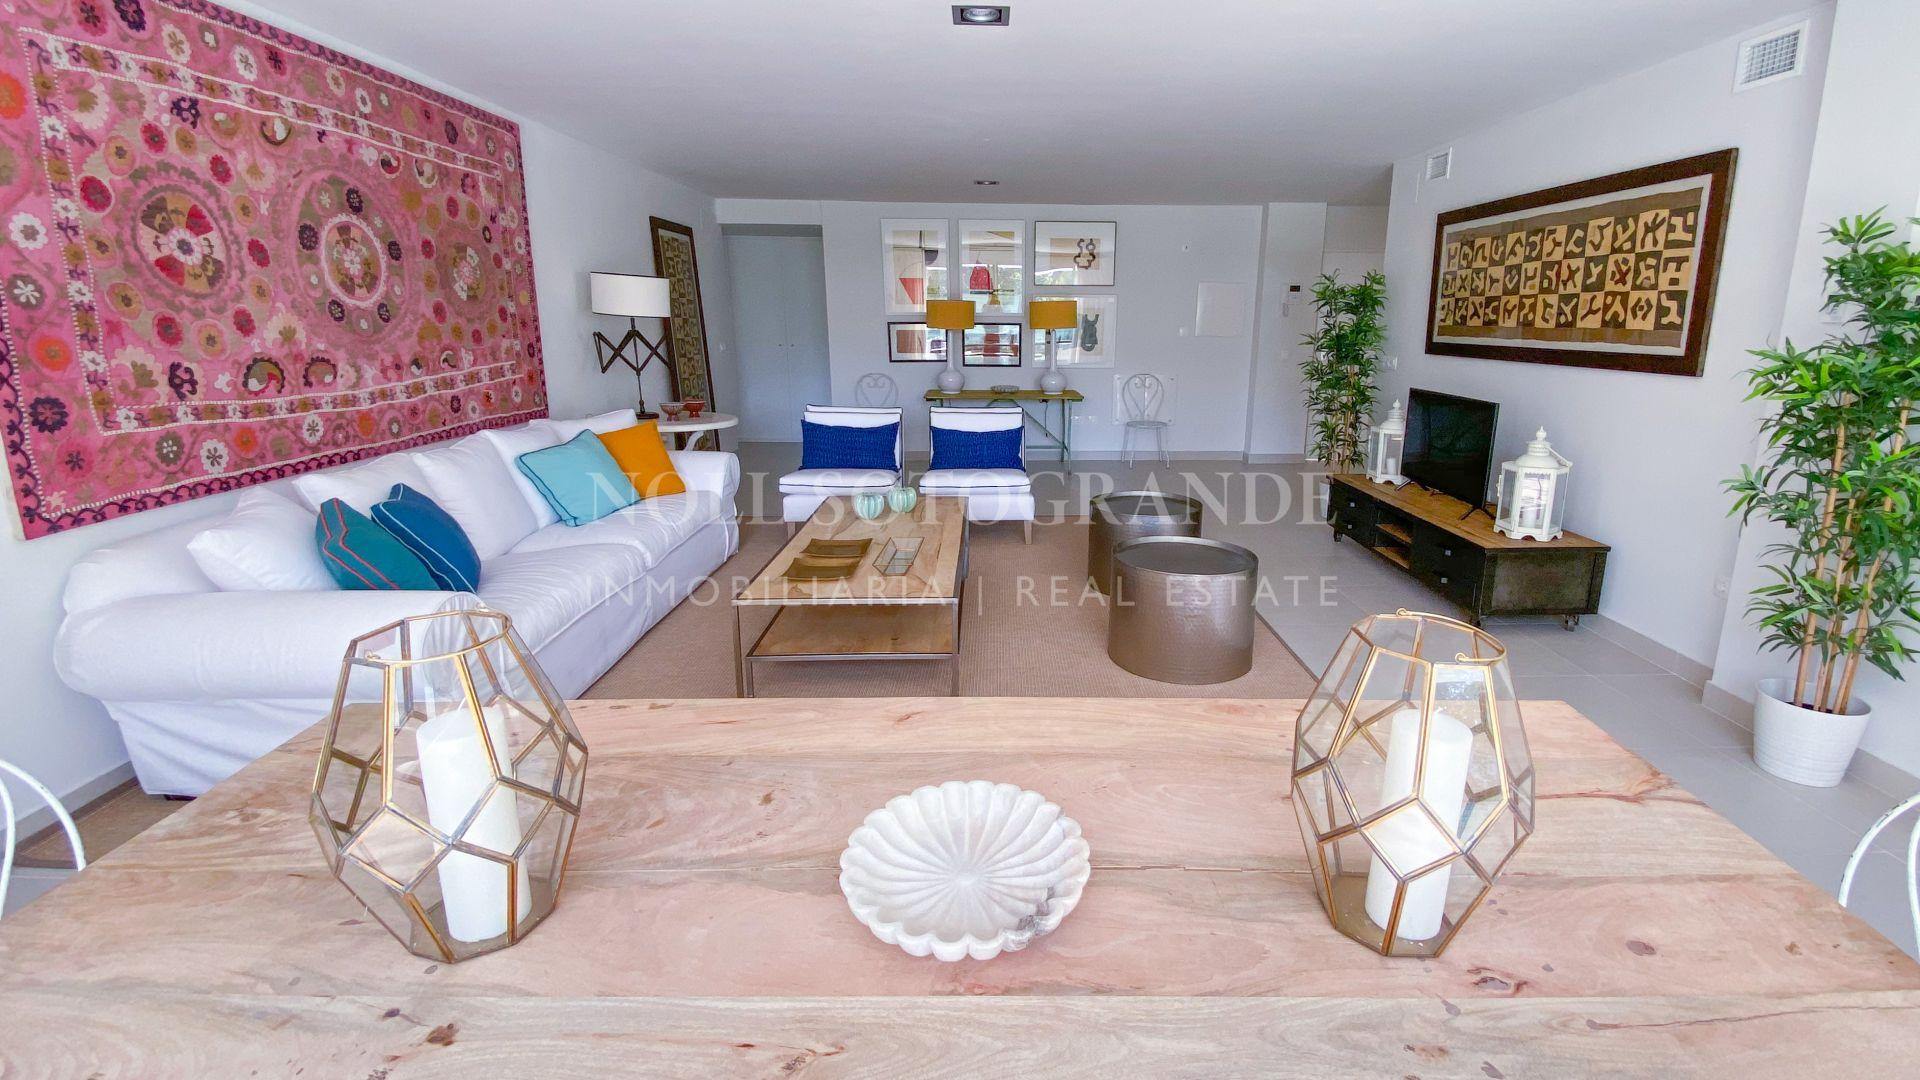 Senda Chica Sotogrande, Penthouse for sale